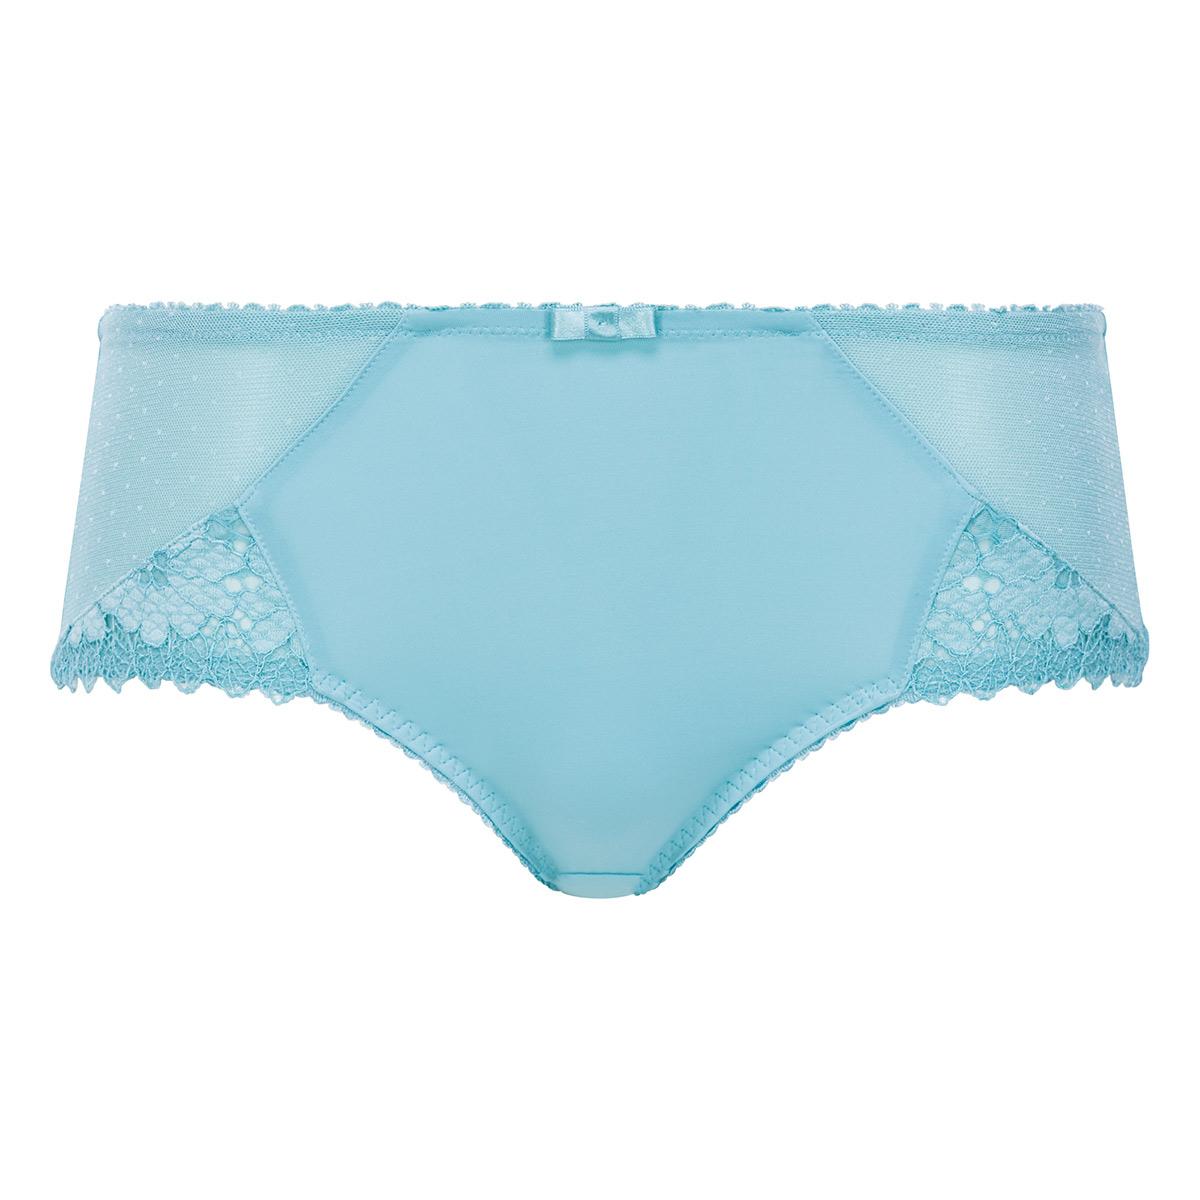 Culotte dentelle Midi bleu lagon - Cœur Croisé Féminin, , PLAYTEX